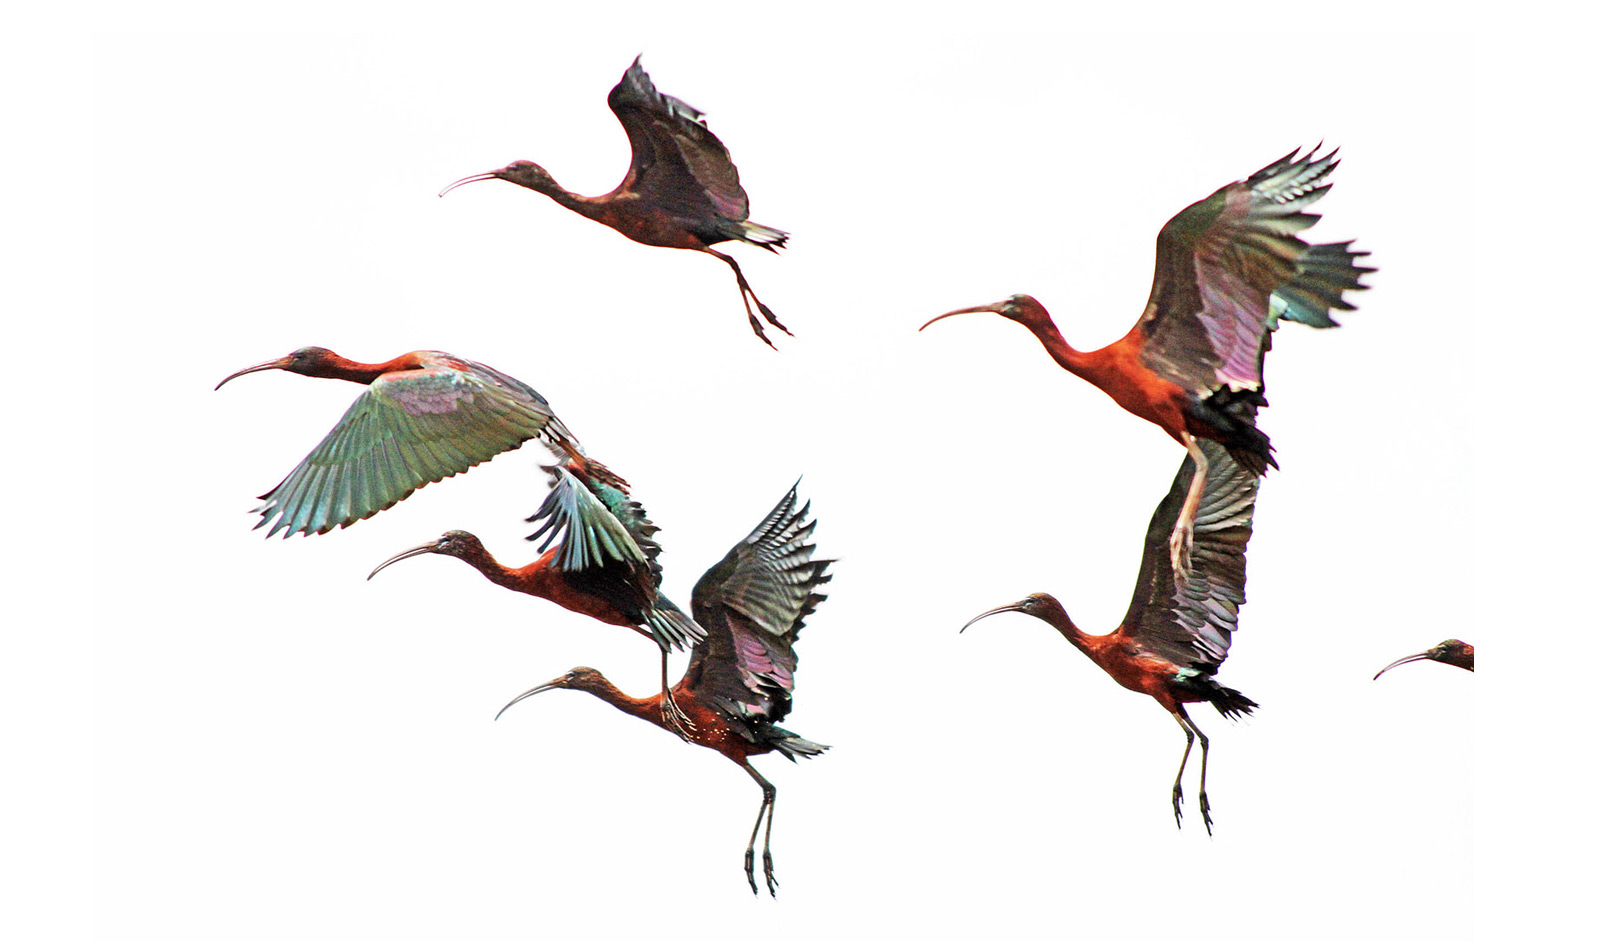 glossy-ibis--ilan-ossendryver-lBronkhorstspruit,-outside-of-Pretoria--Gauteng